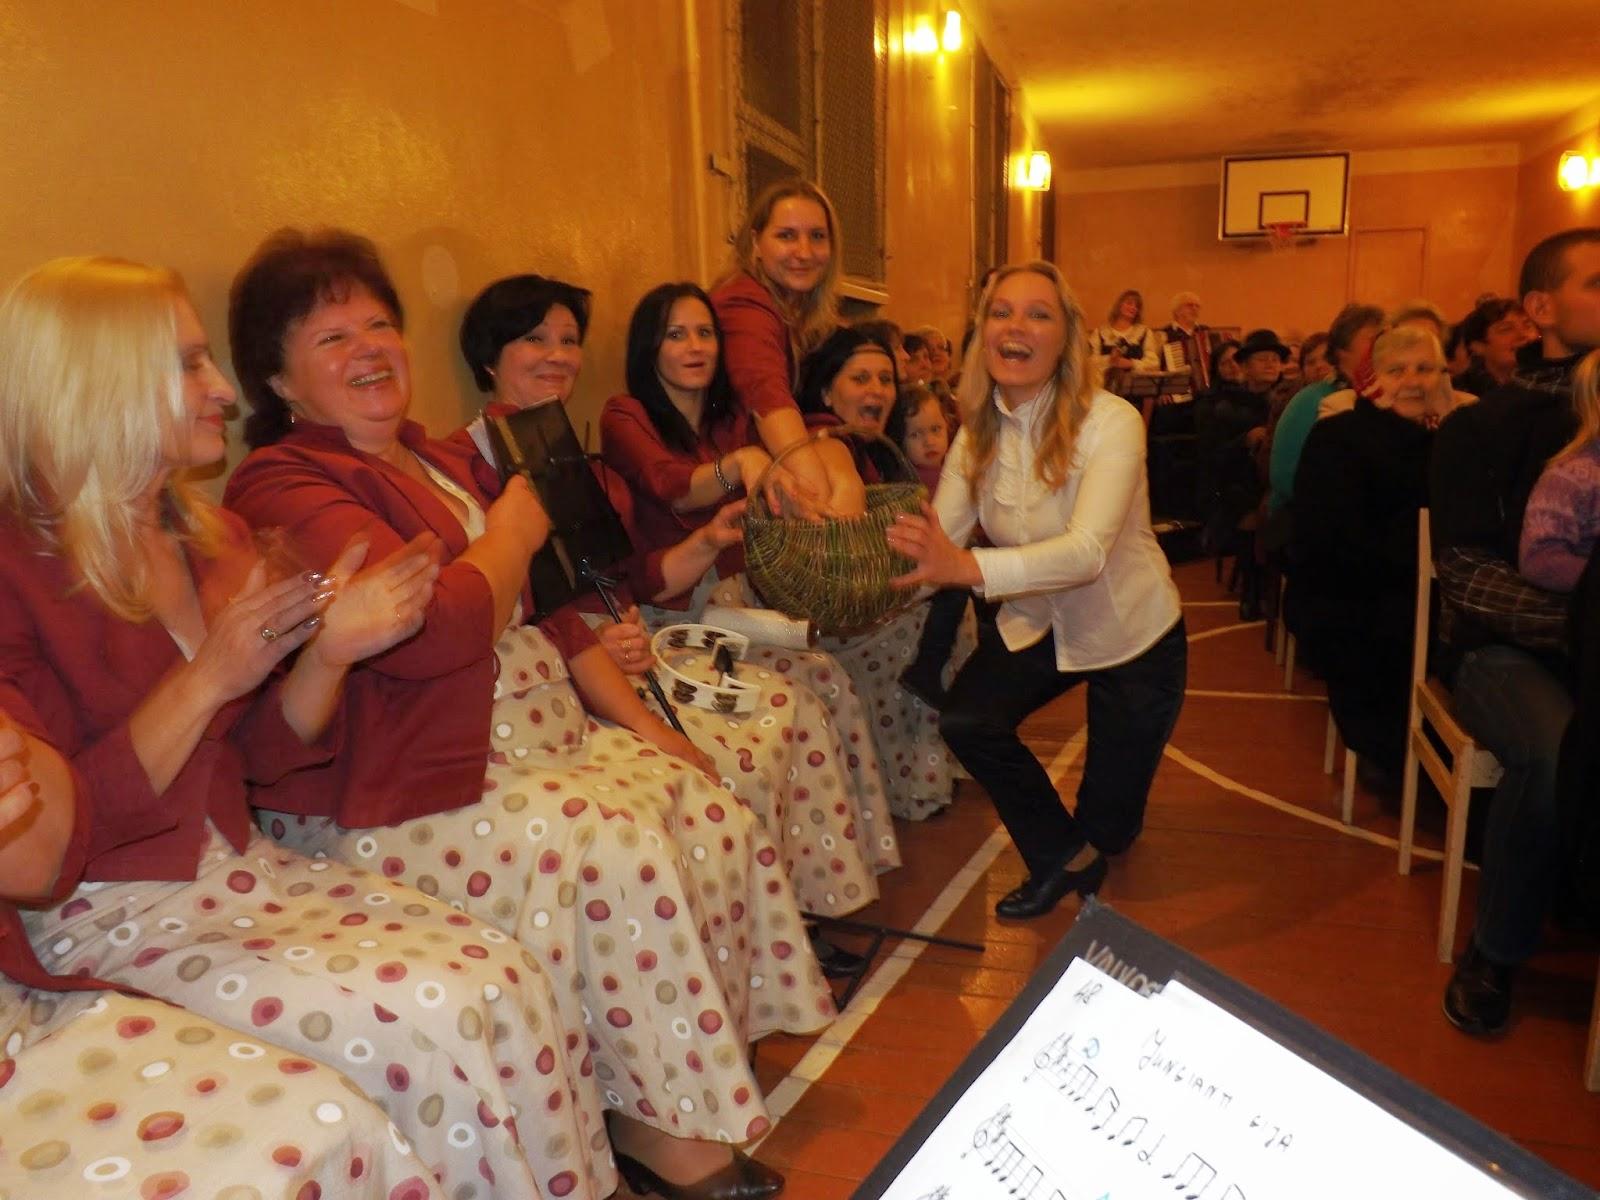 http://www.kupiskiokultura.lt/search/label/Liaudies%20muzikos%20akordai%20jau%20penktojoje%20-Spanguolyn%C4%97je